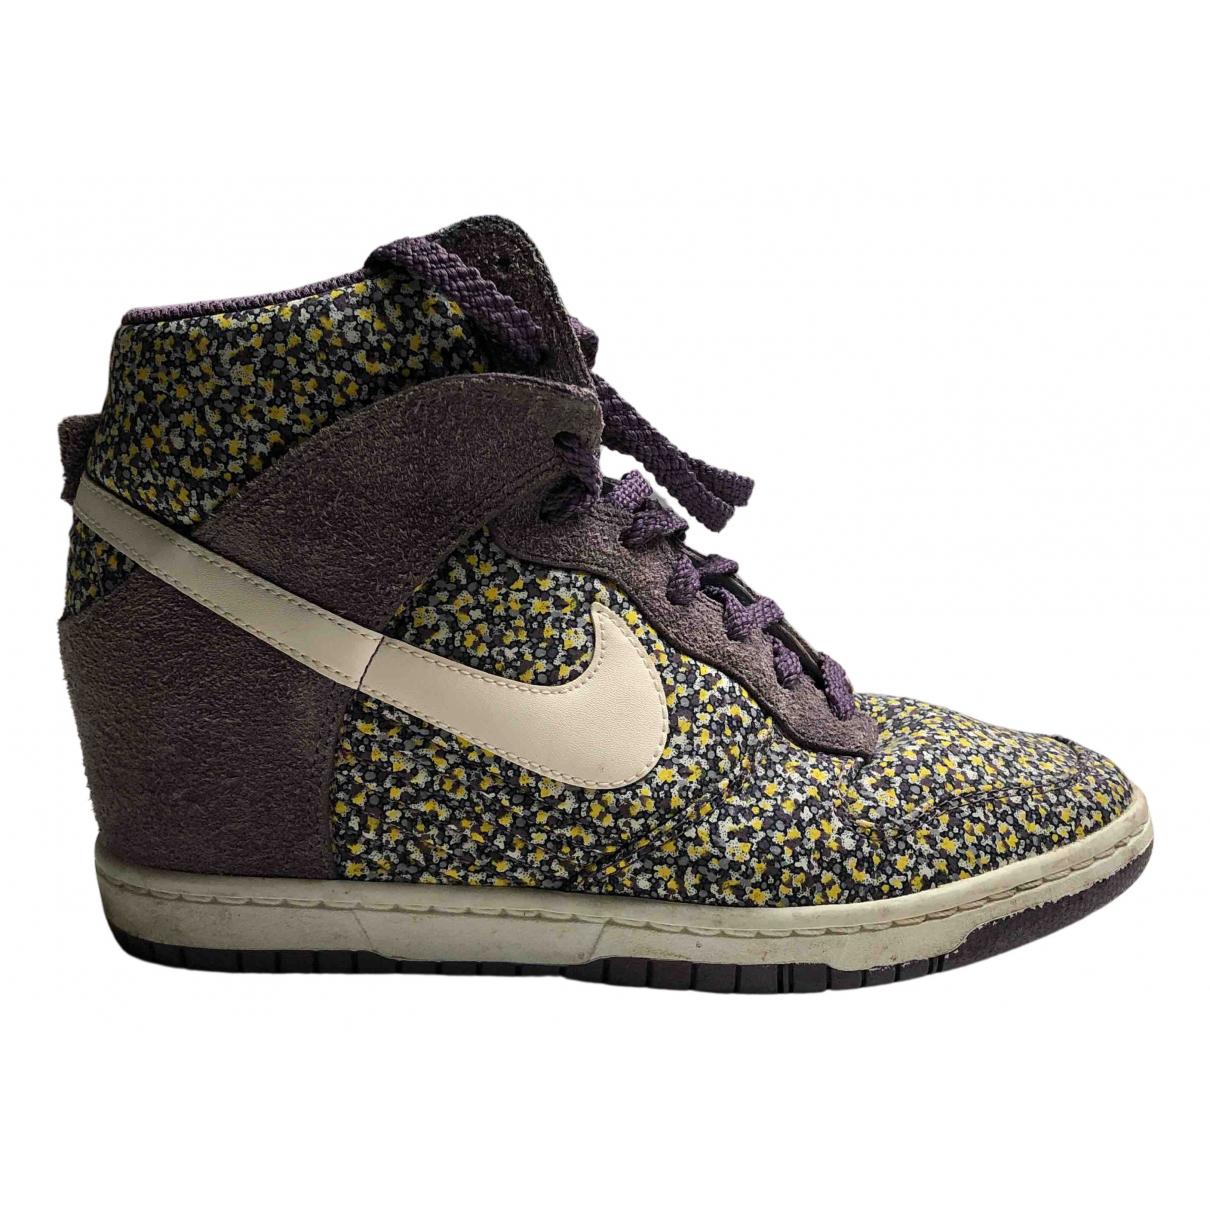 Nike SB Dunk  Sneakers in  Bunt Leinen